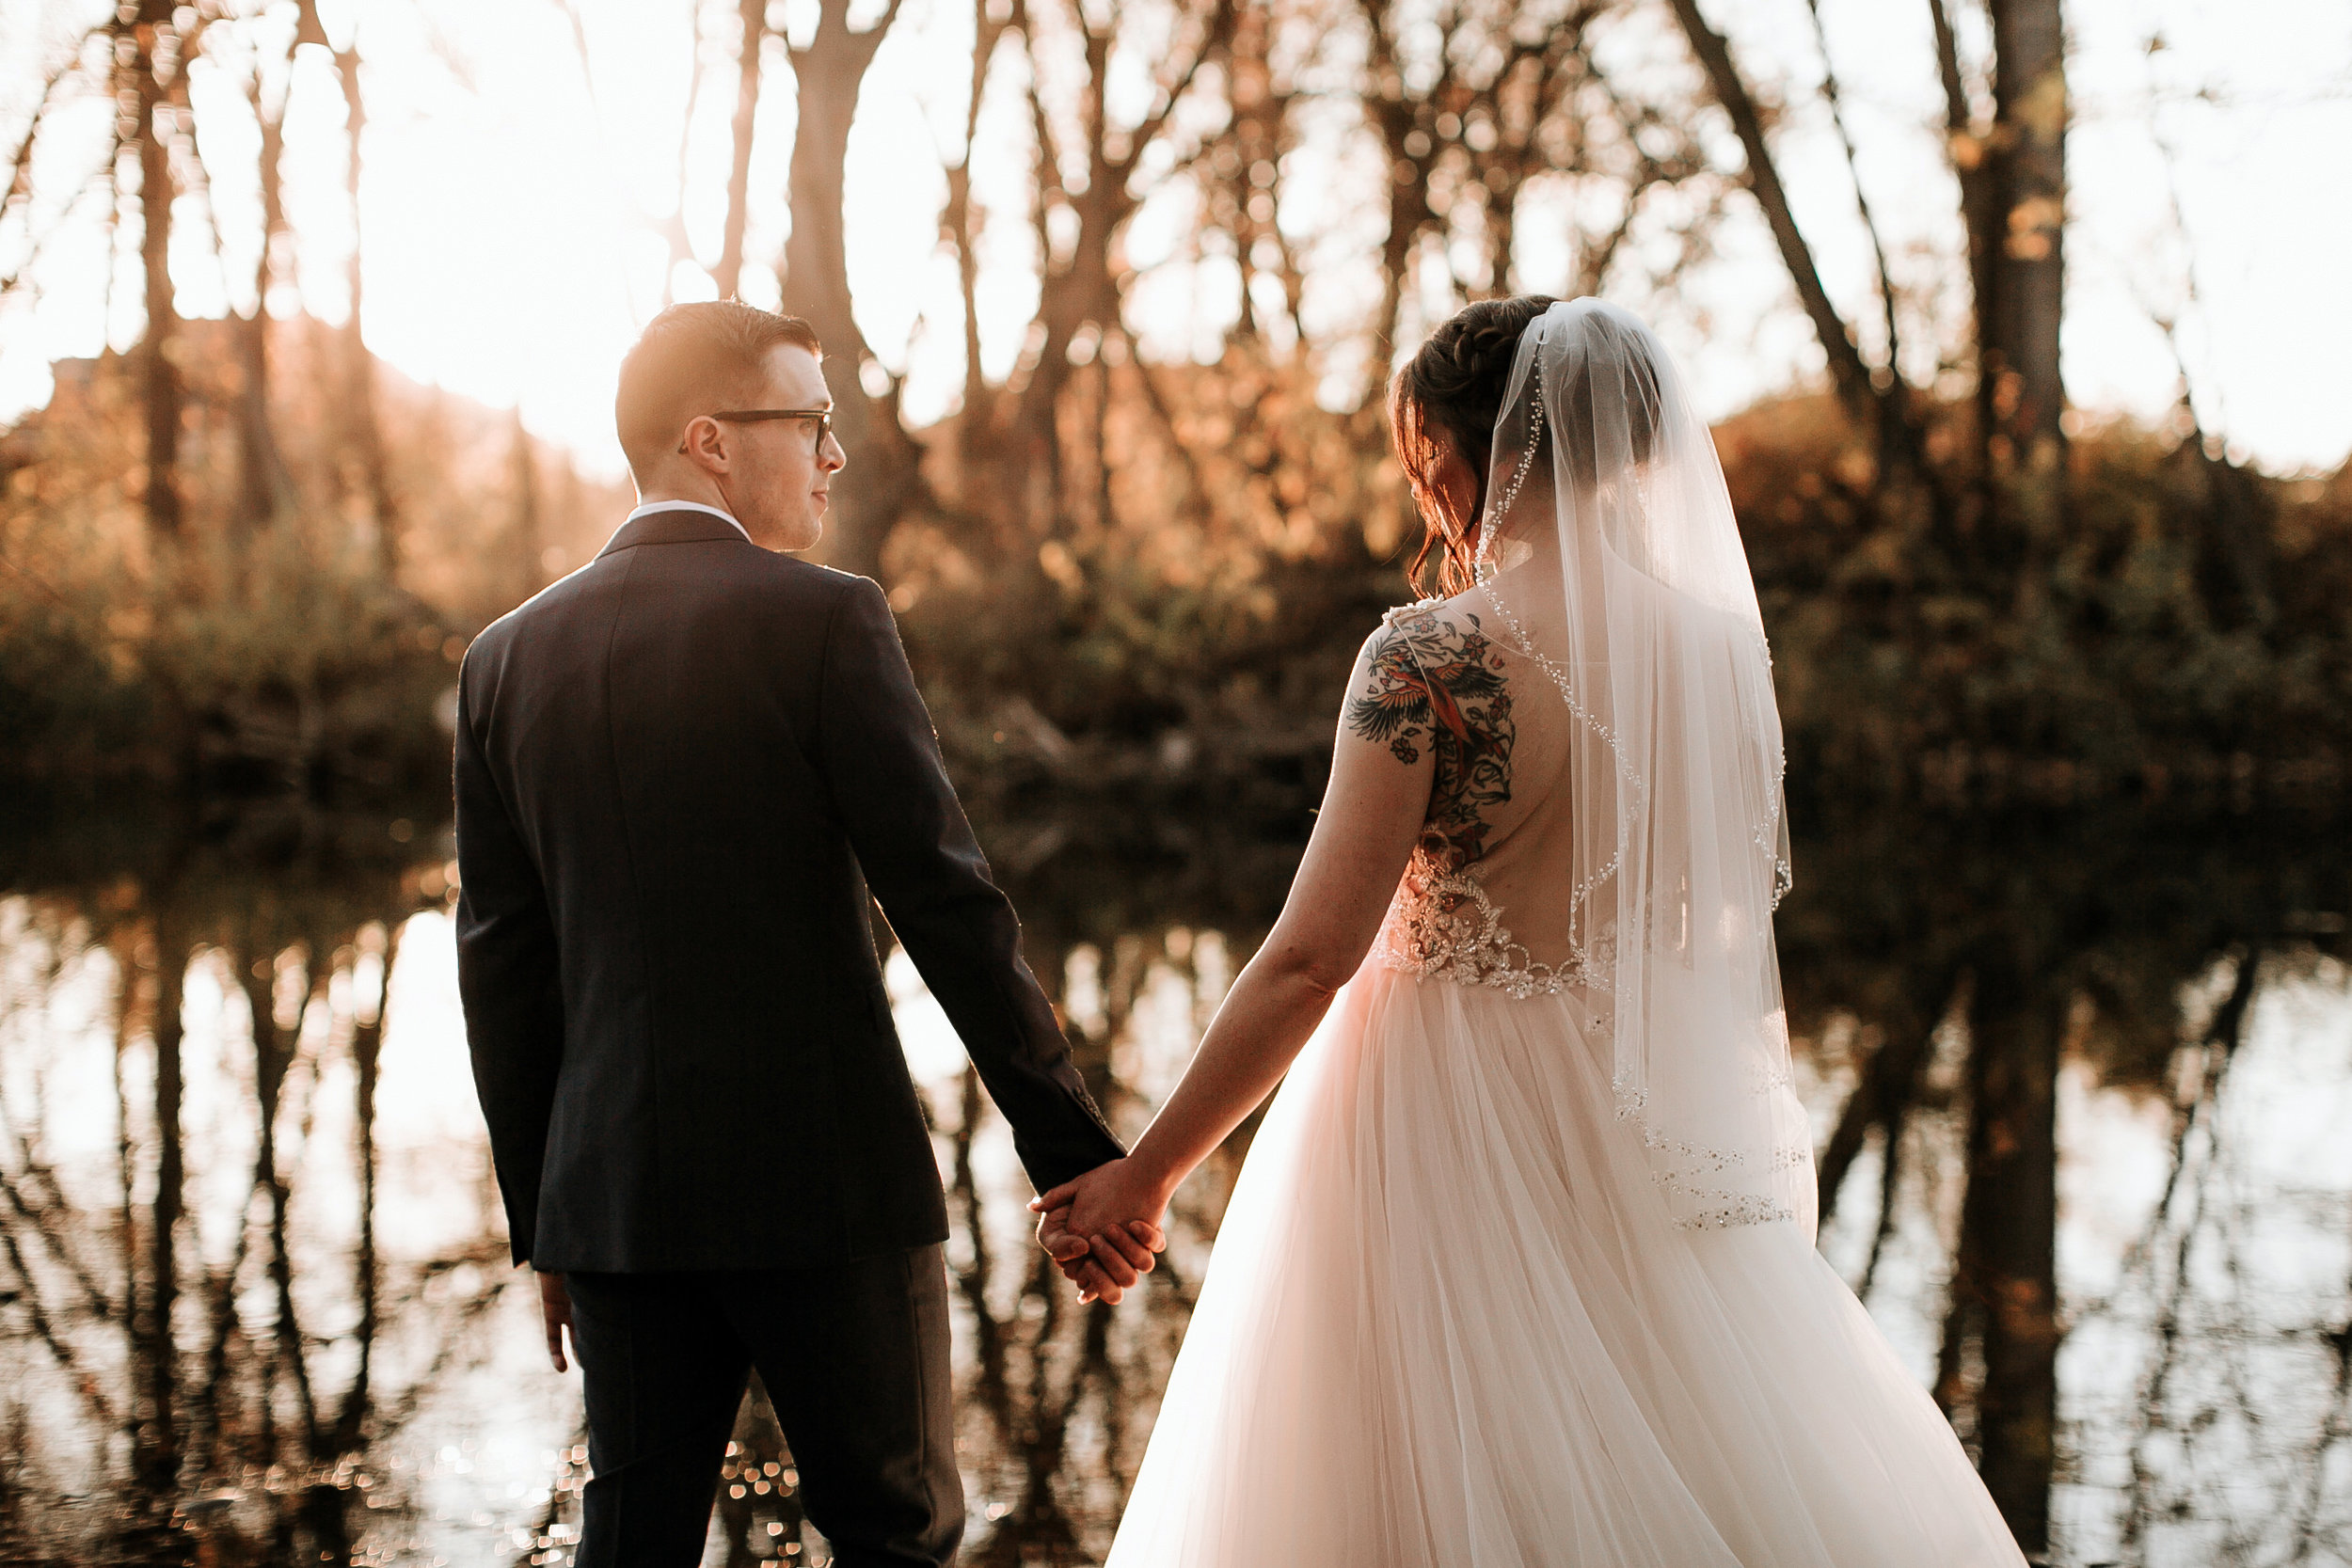 Boise, Idaho Wedding  Ian and Georgina tie the knot.